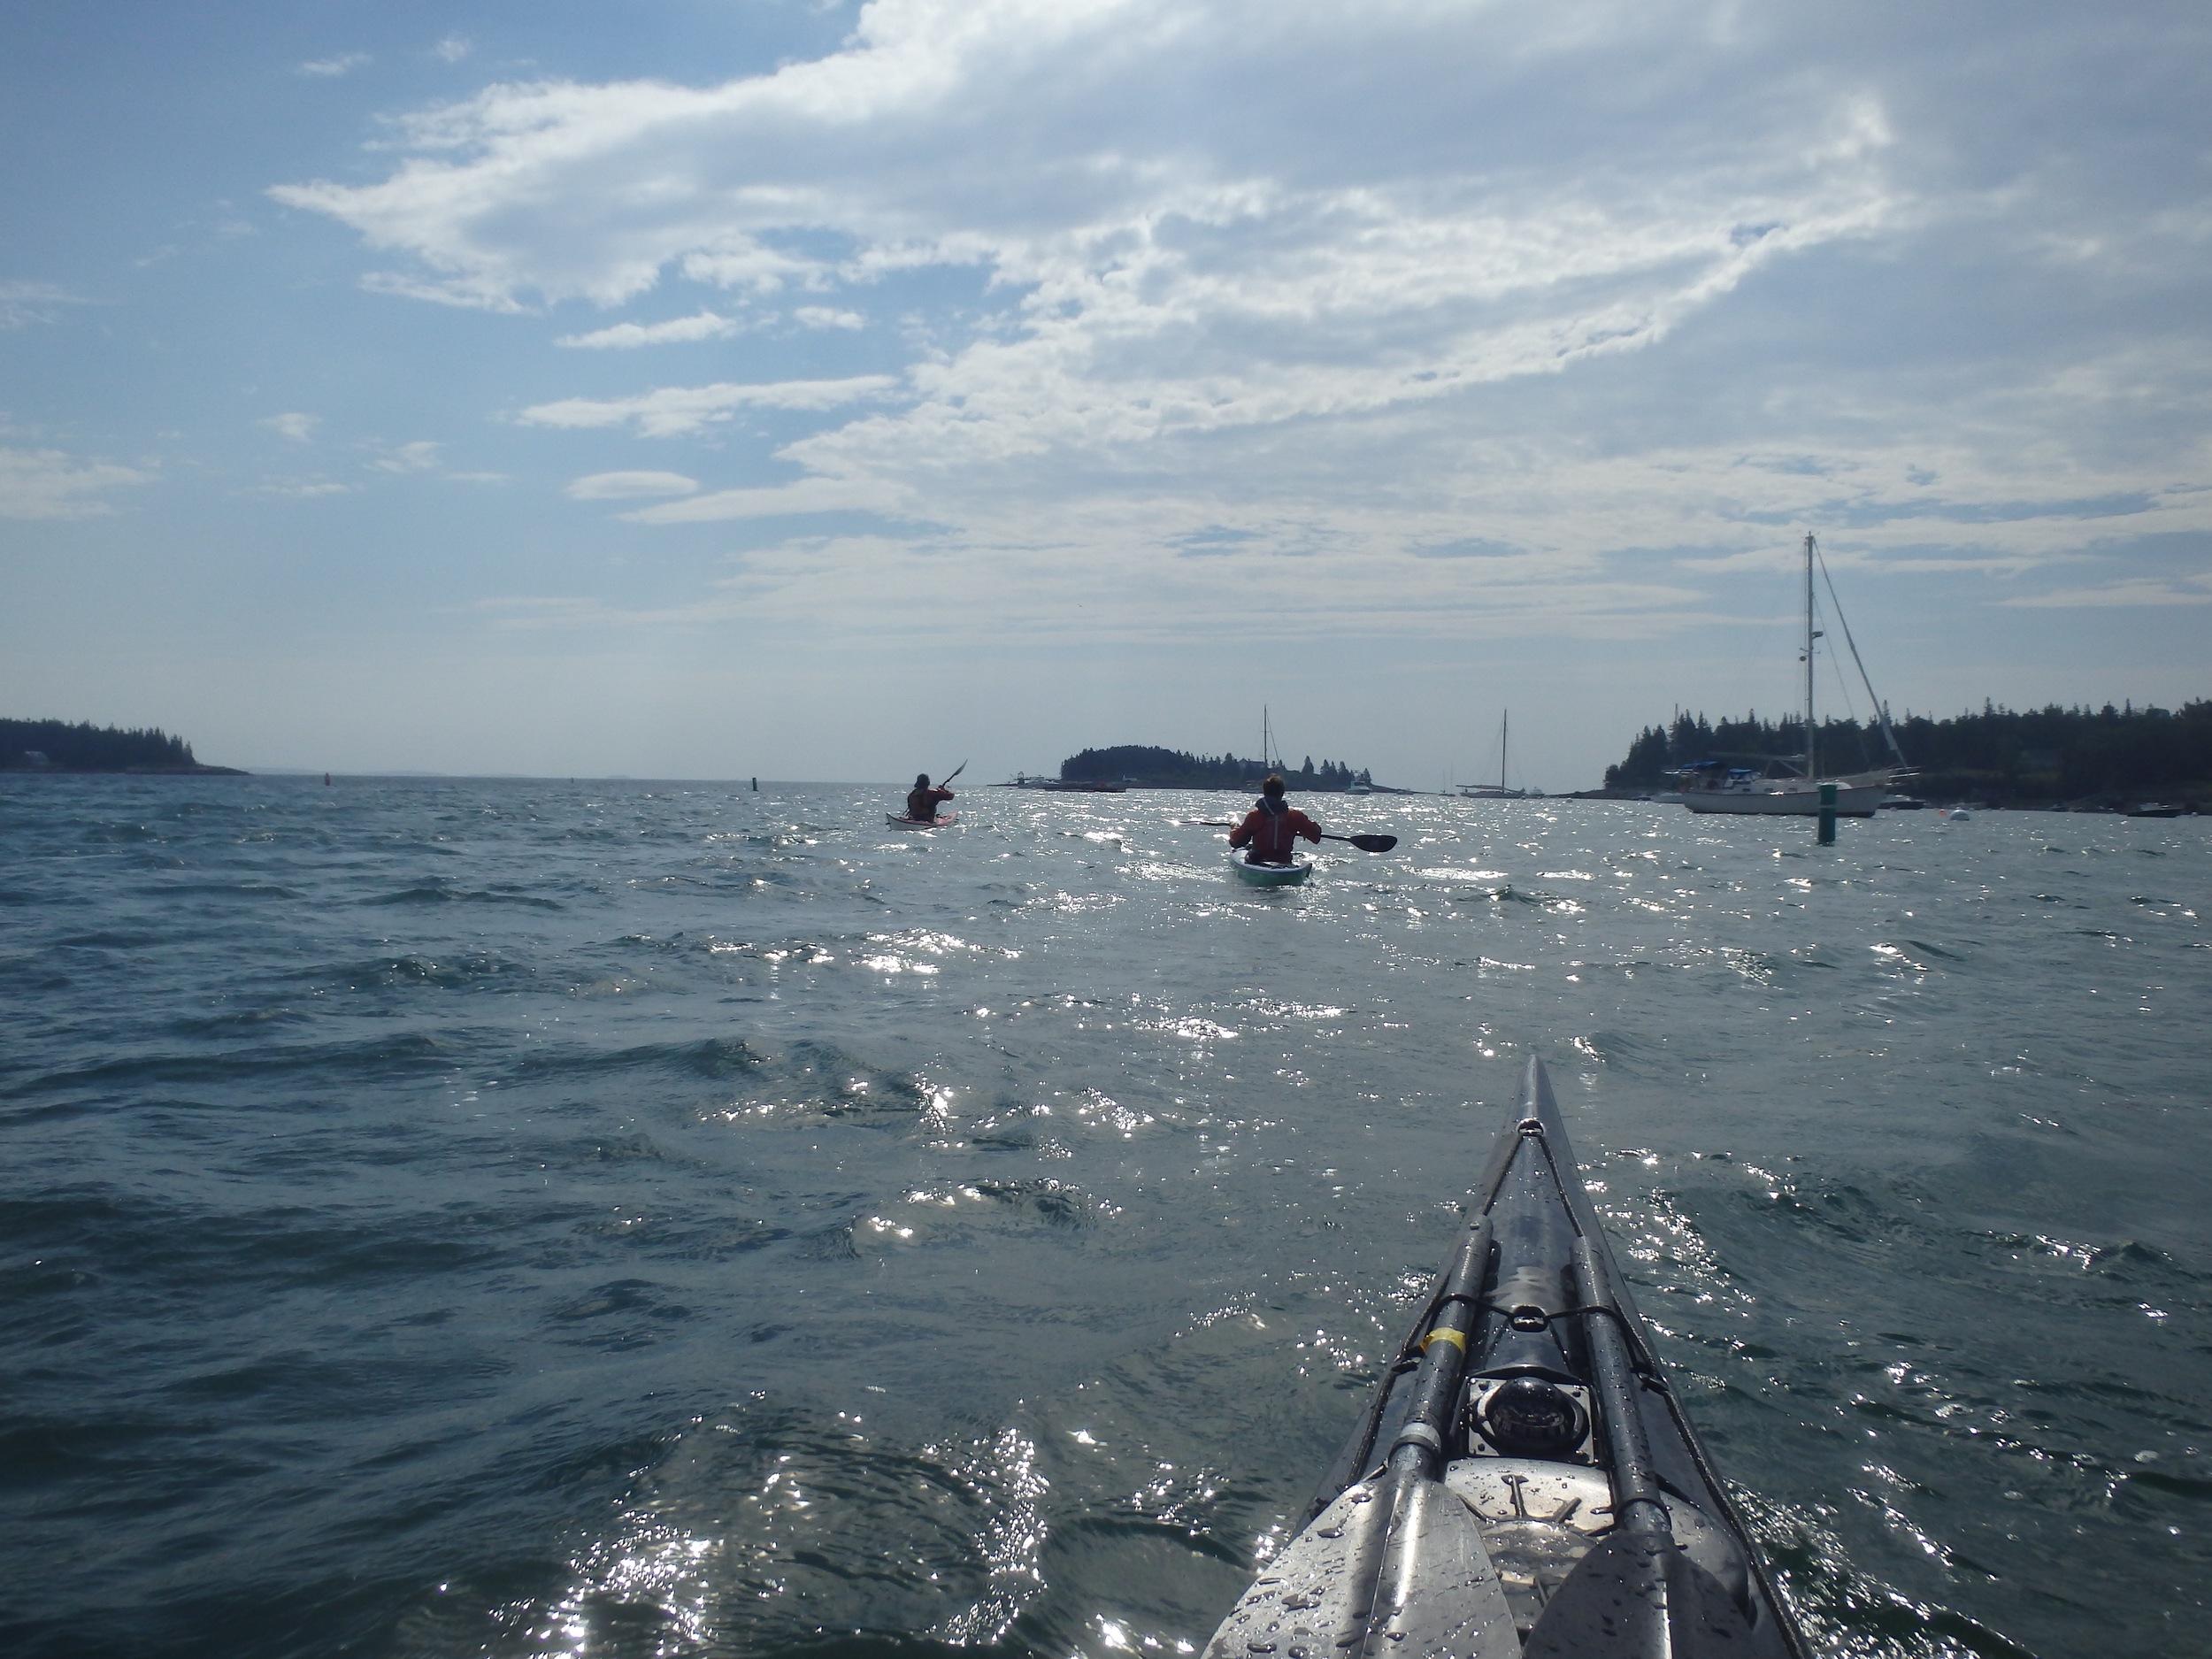 Leaving Tenants Harbor